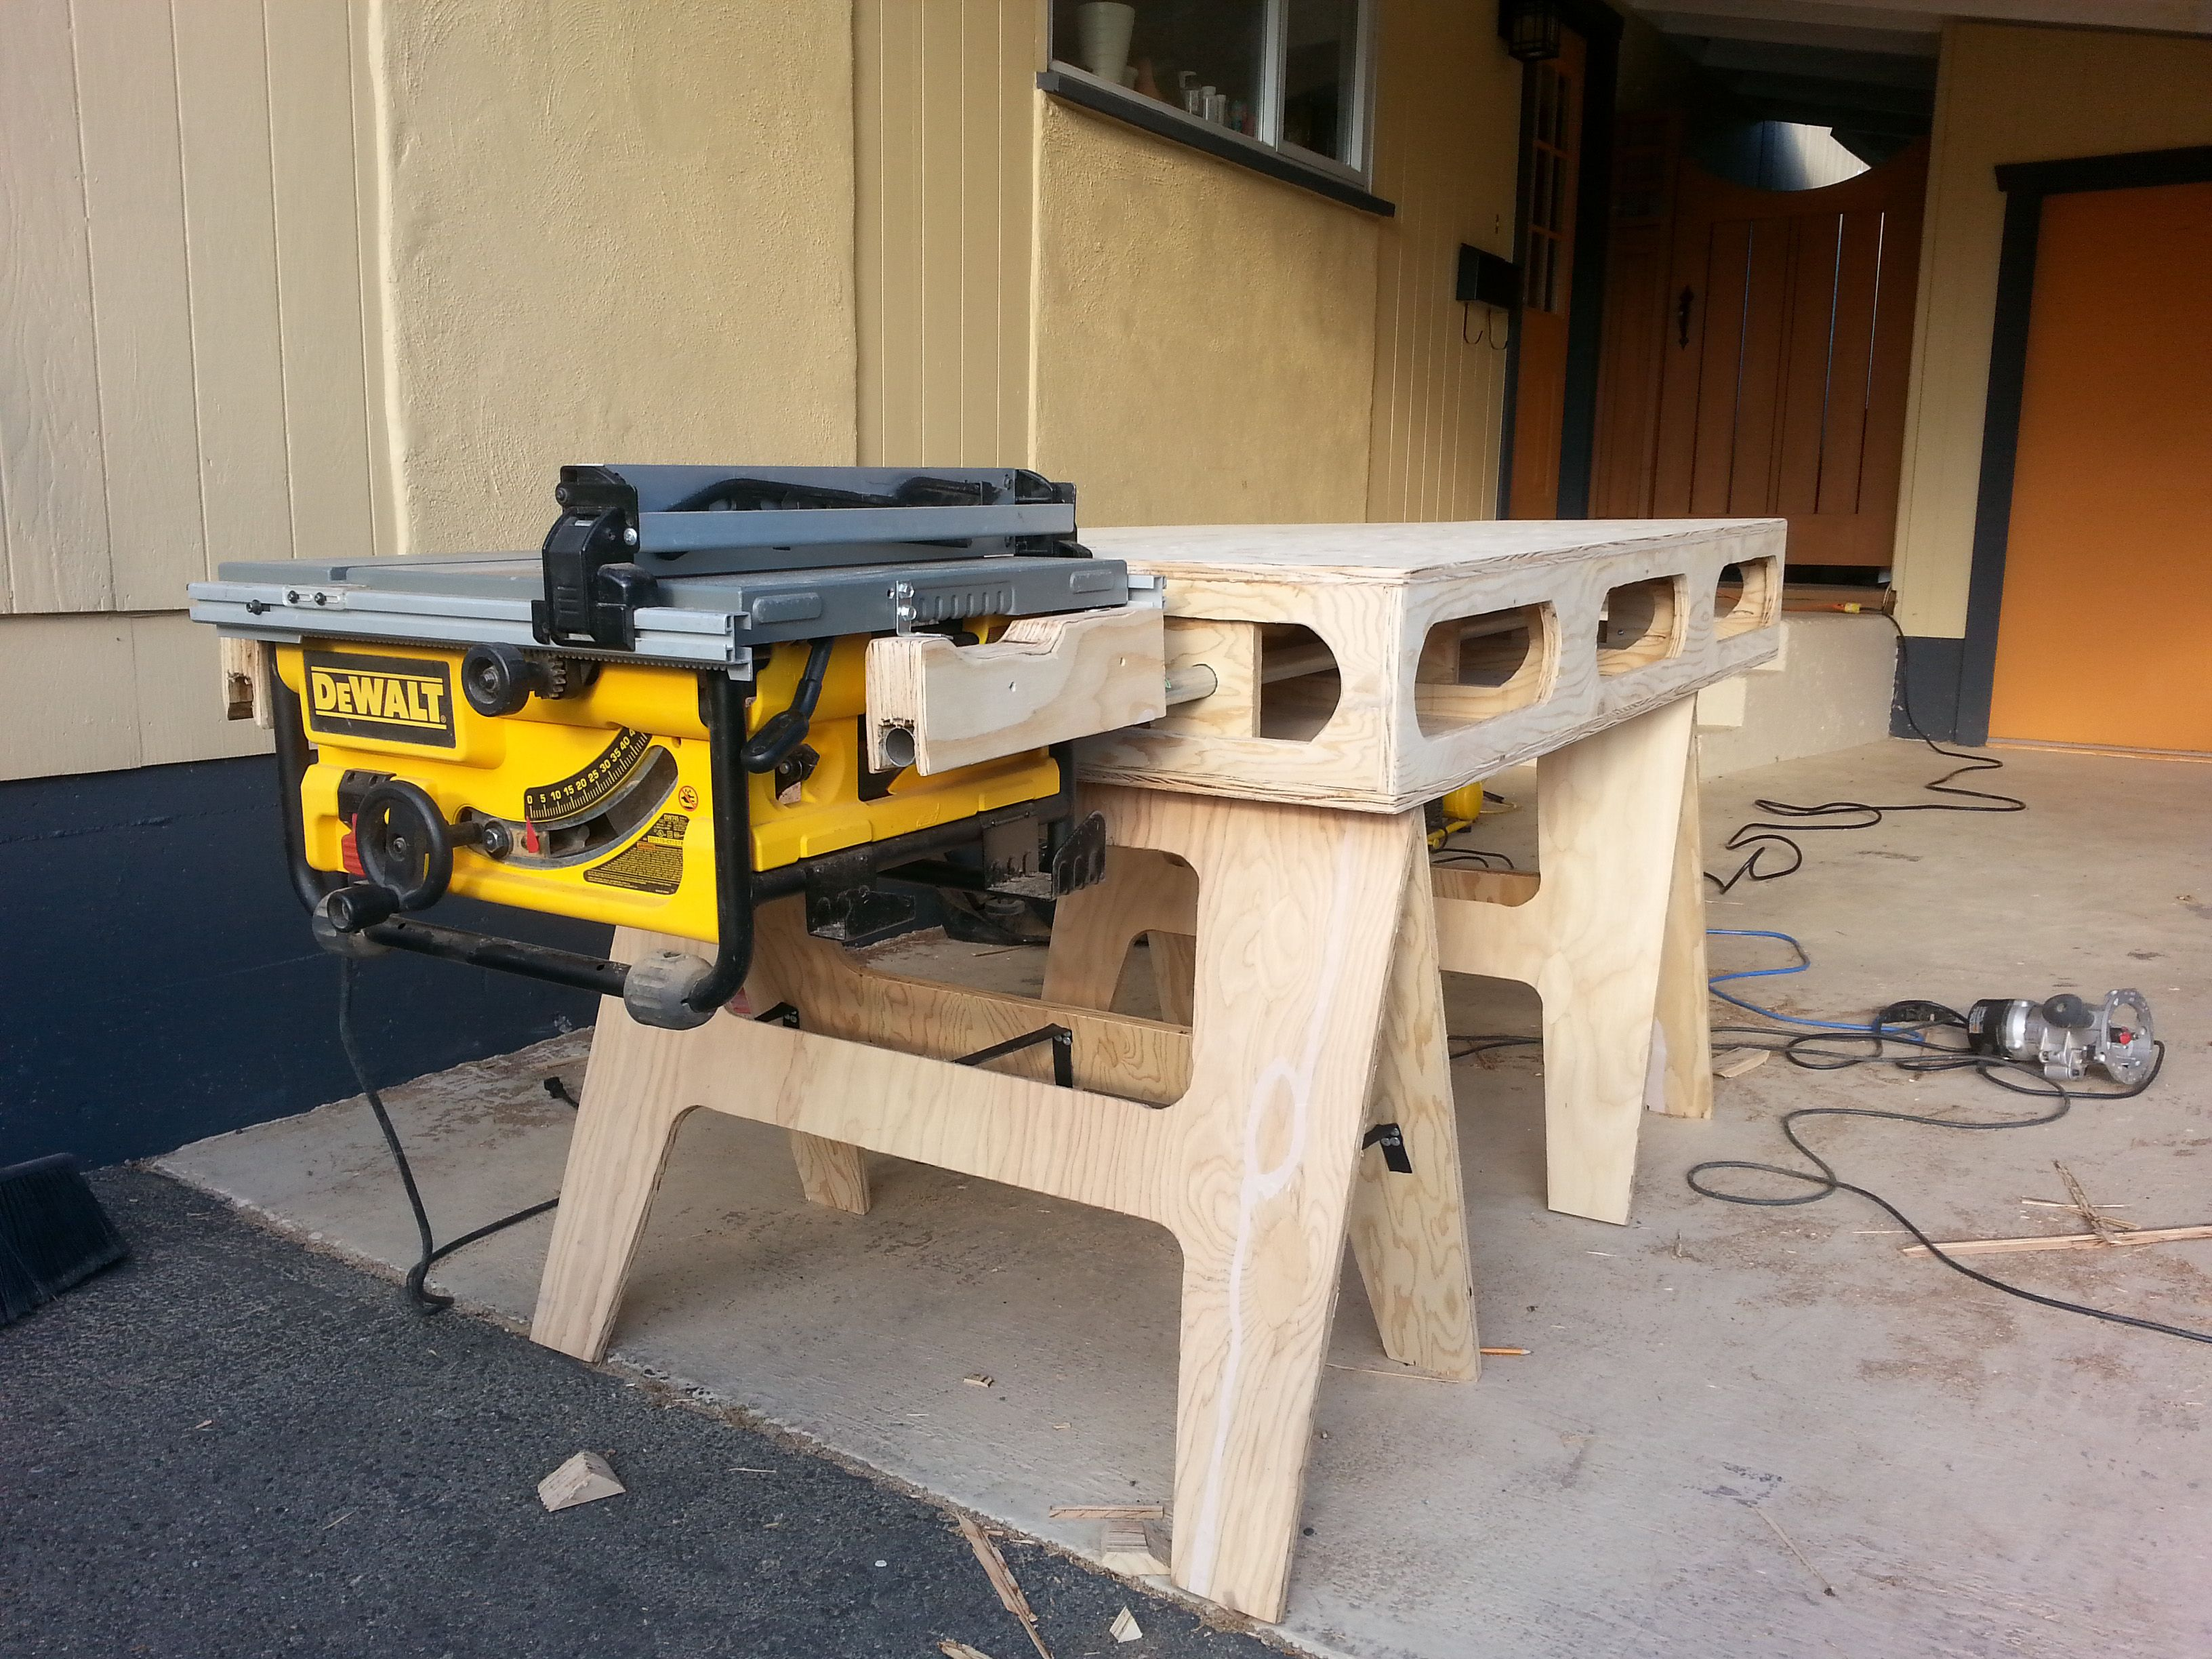 The Paulk Workbench Workbench Paulk Woodworking Diy Dewalt Saw Diy Table Saw Paulk Workbench Woodworking Items That Sell